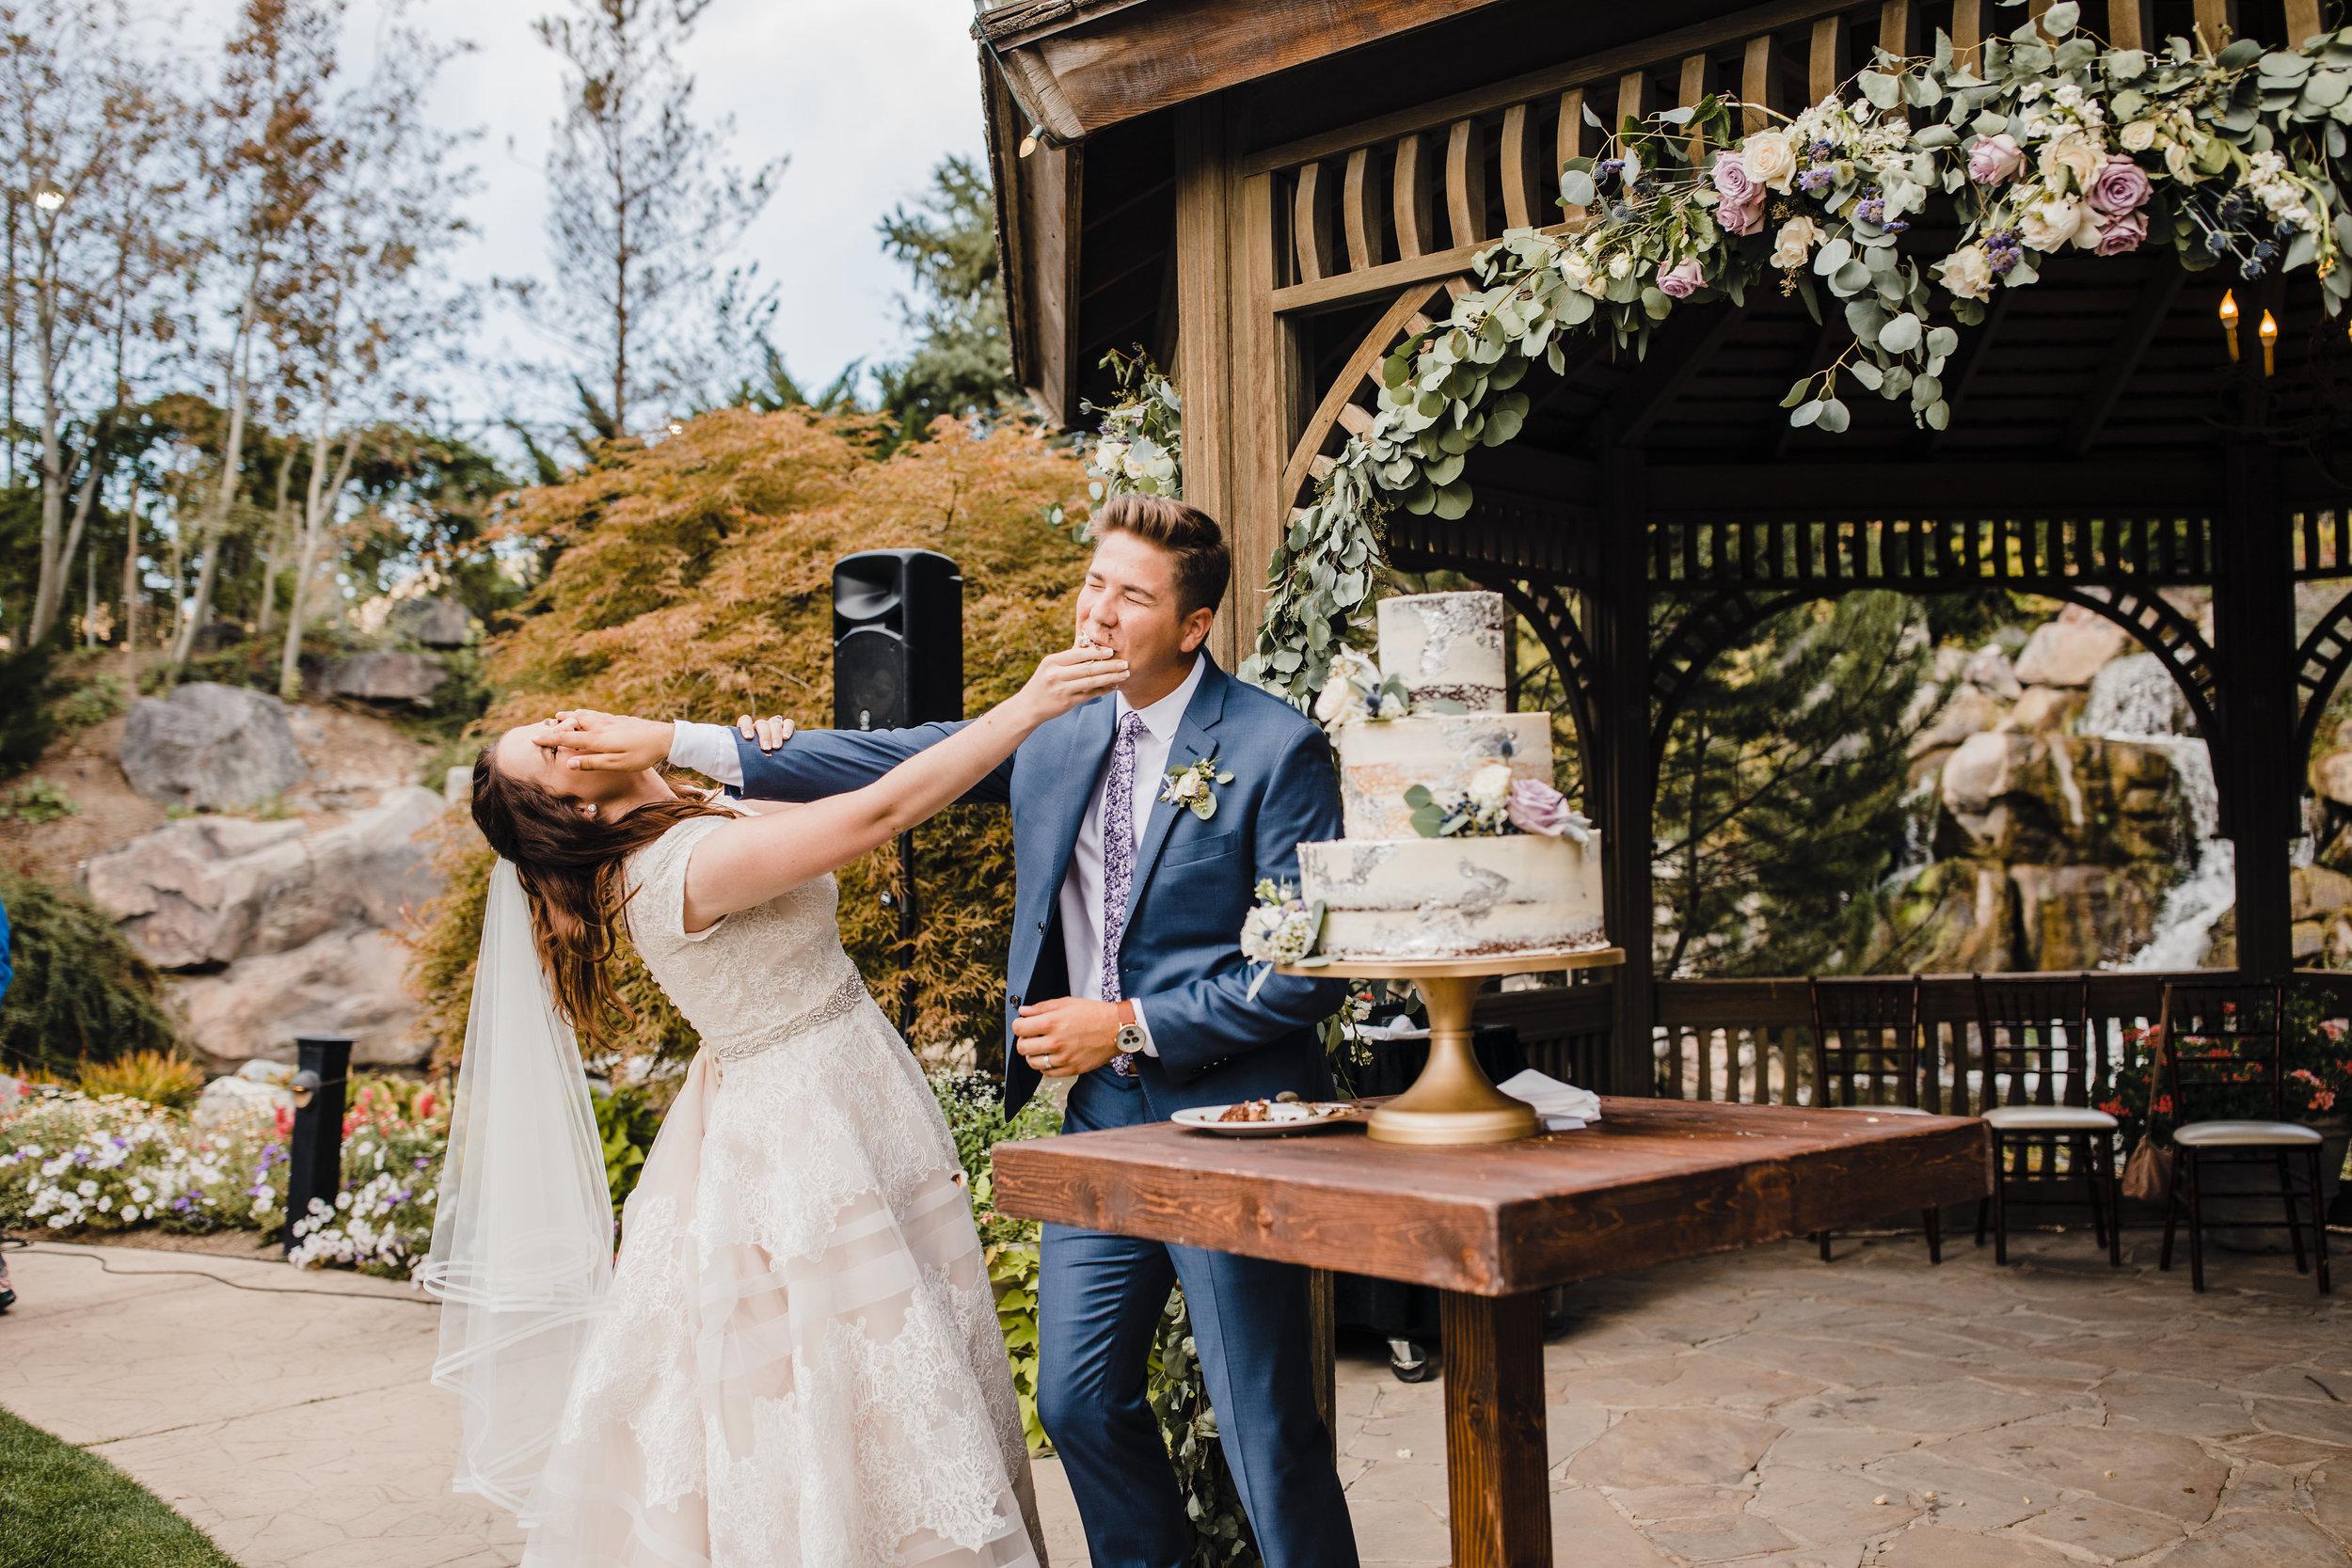 provo utah wedding photographer cake cutting outdoor reception smashing playful